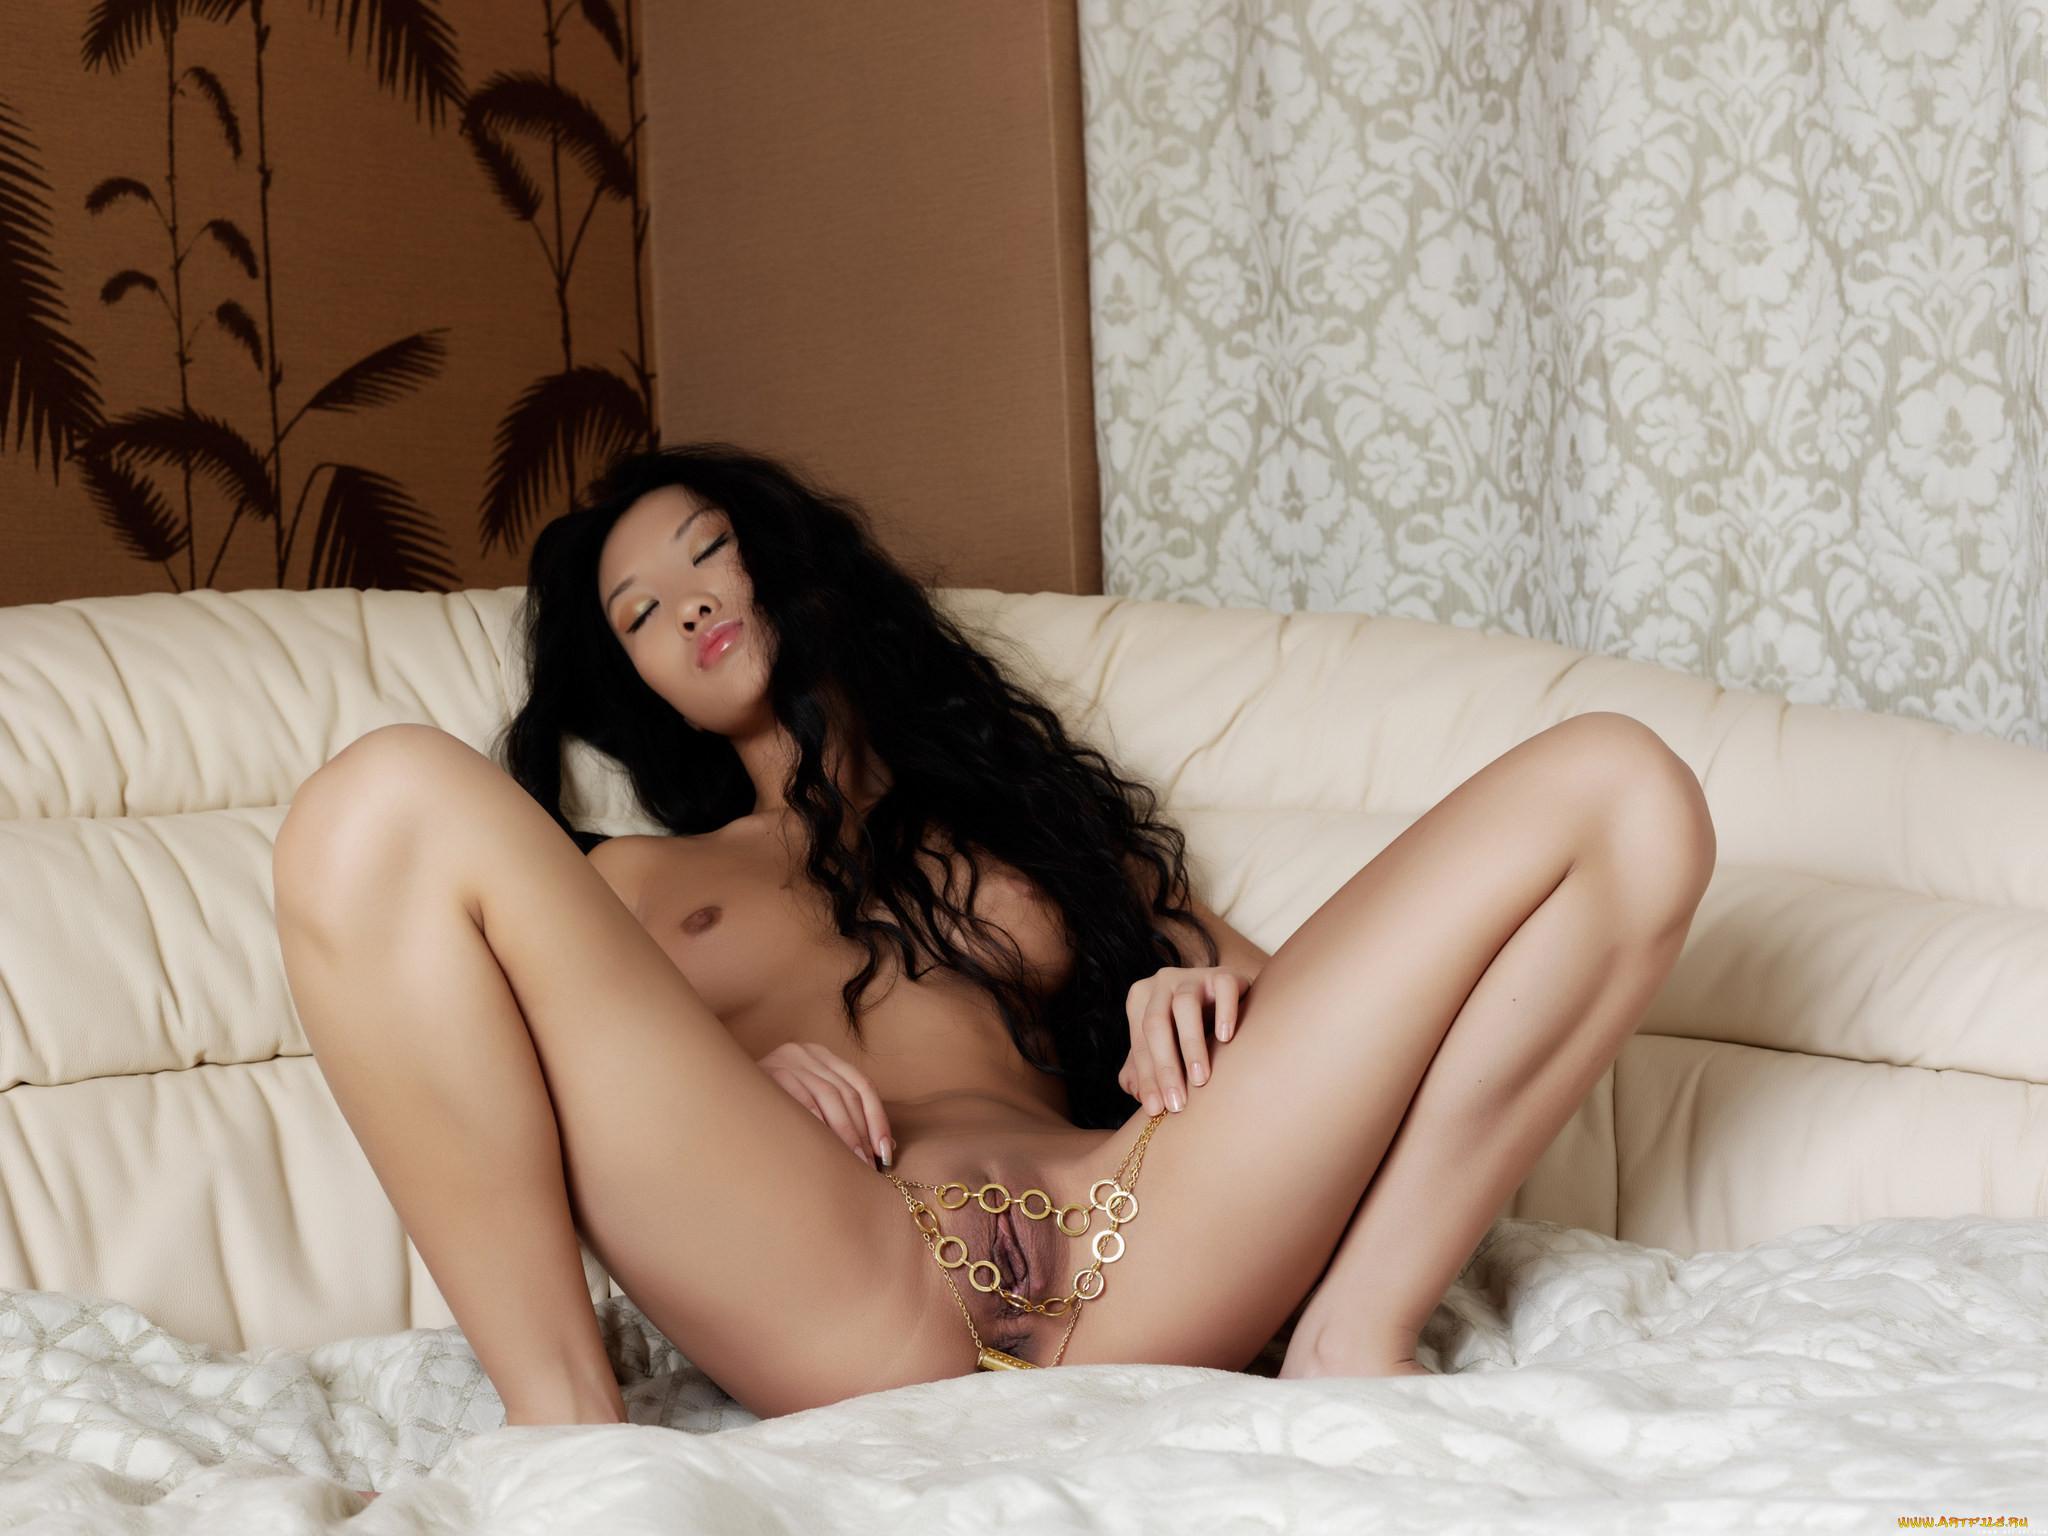 Mariko порномодель